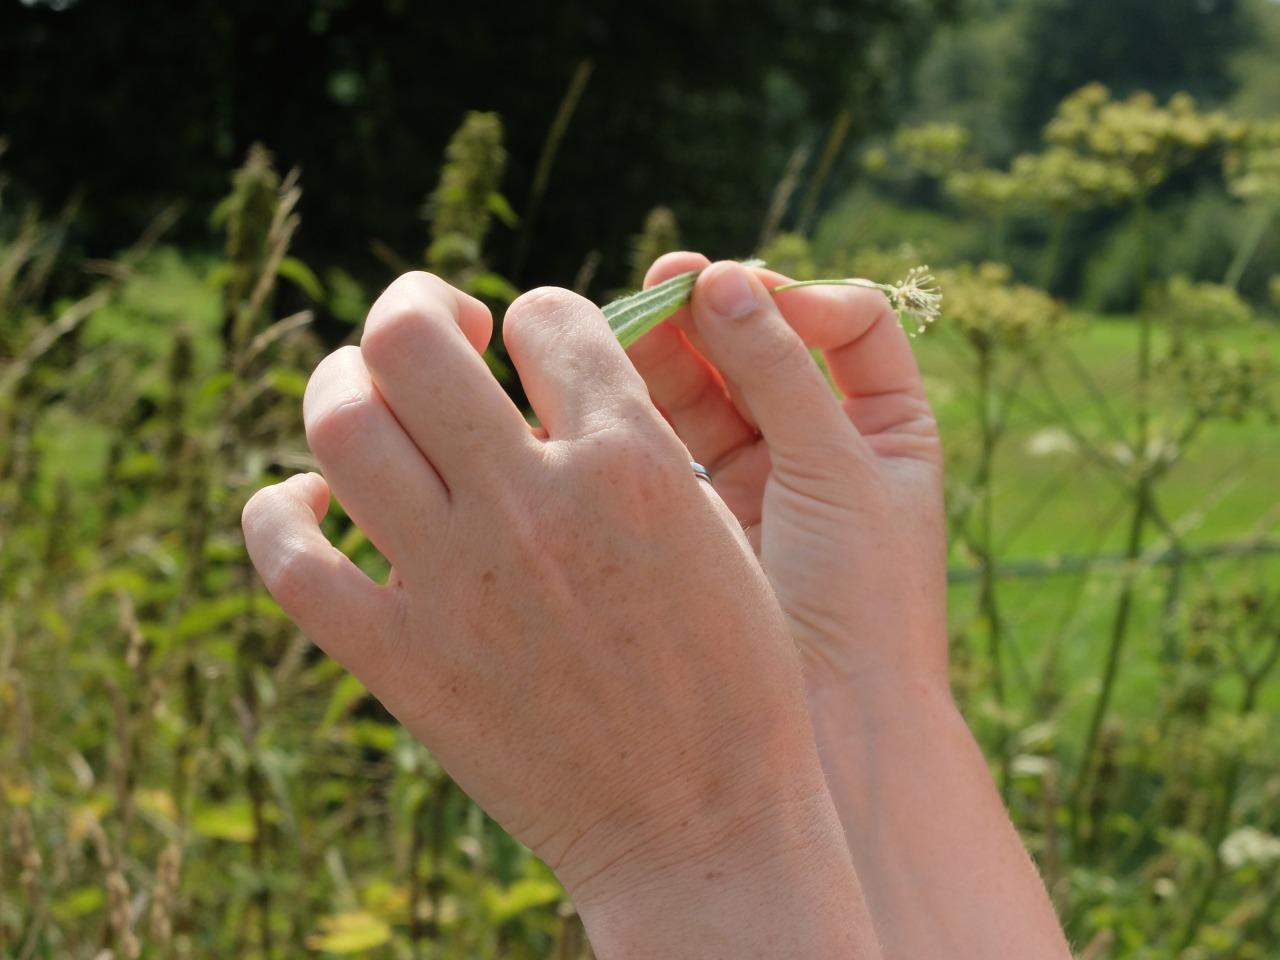 mangia minga // 'Wildkräuter: Foraging Wild Herbs' Spitzwegerich - ribwort